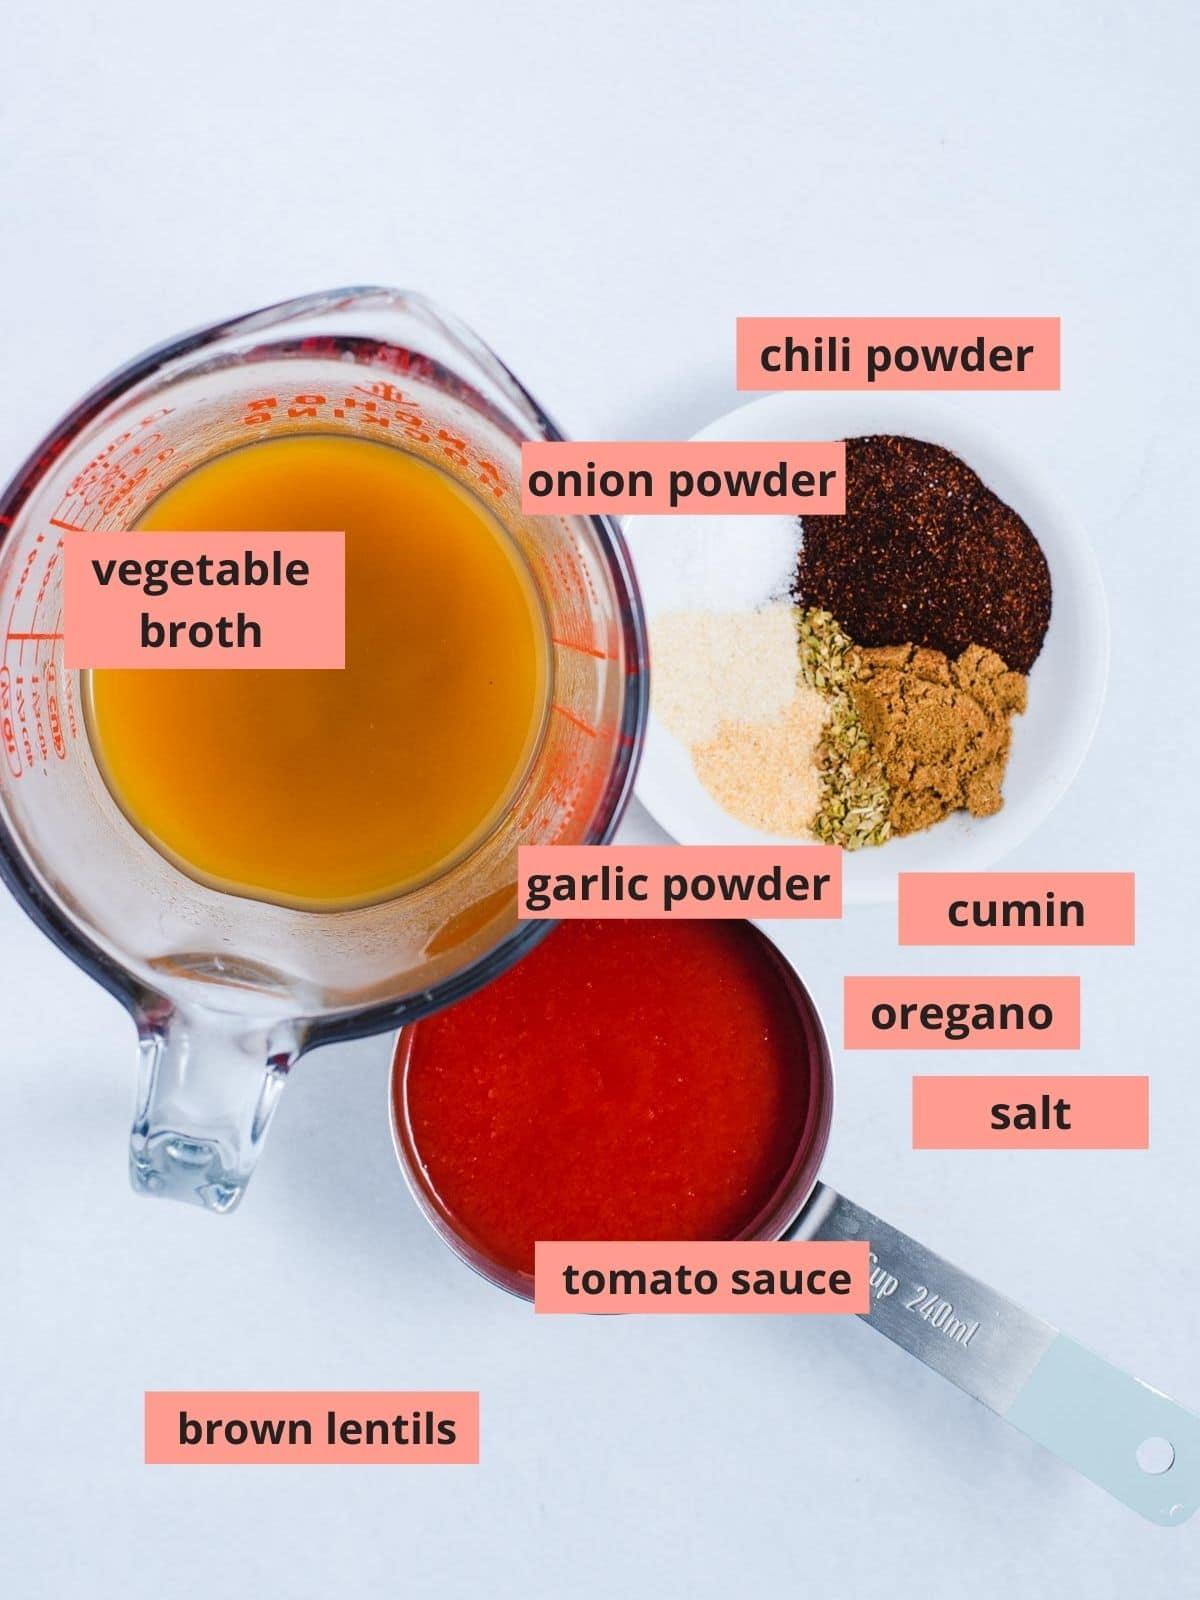 Labeled ingredients used to make lentil tacos